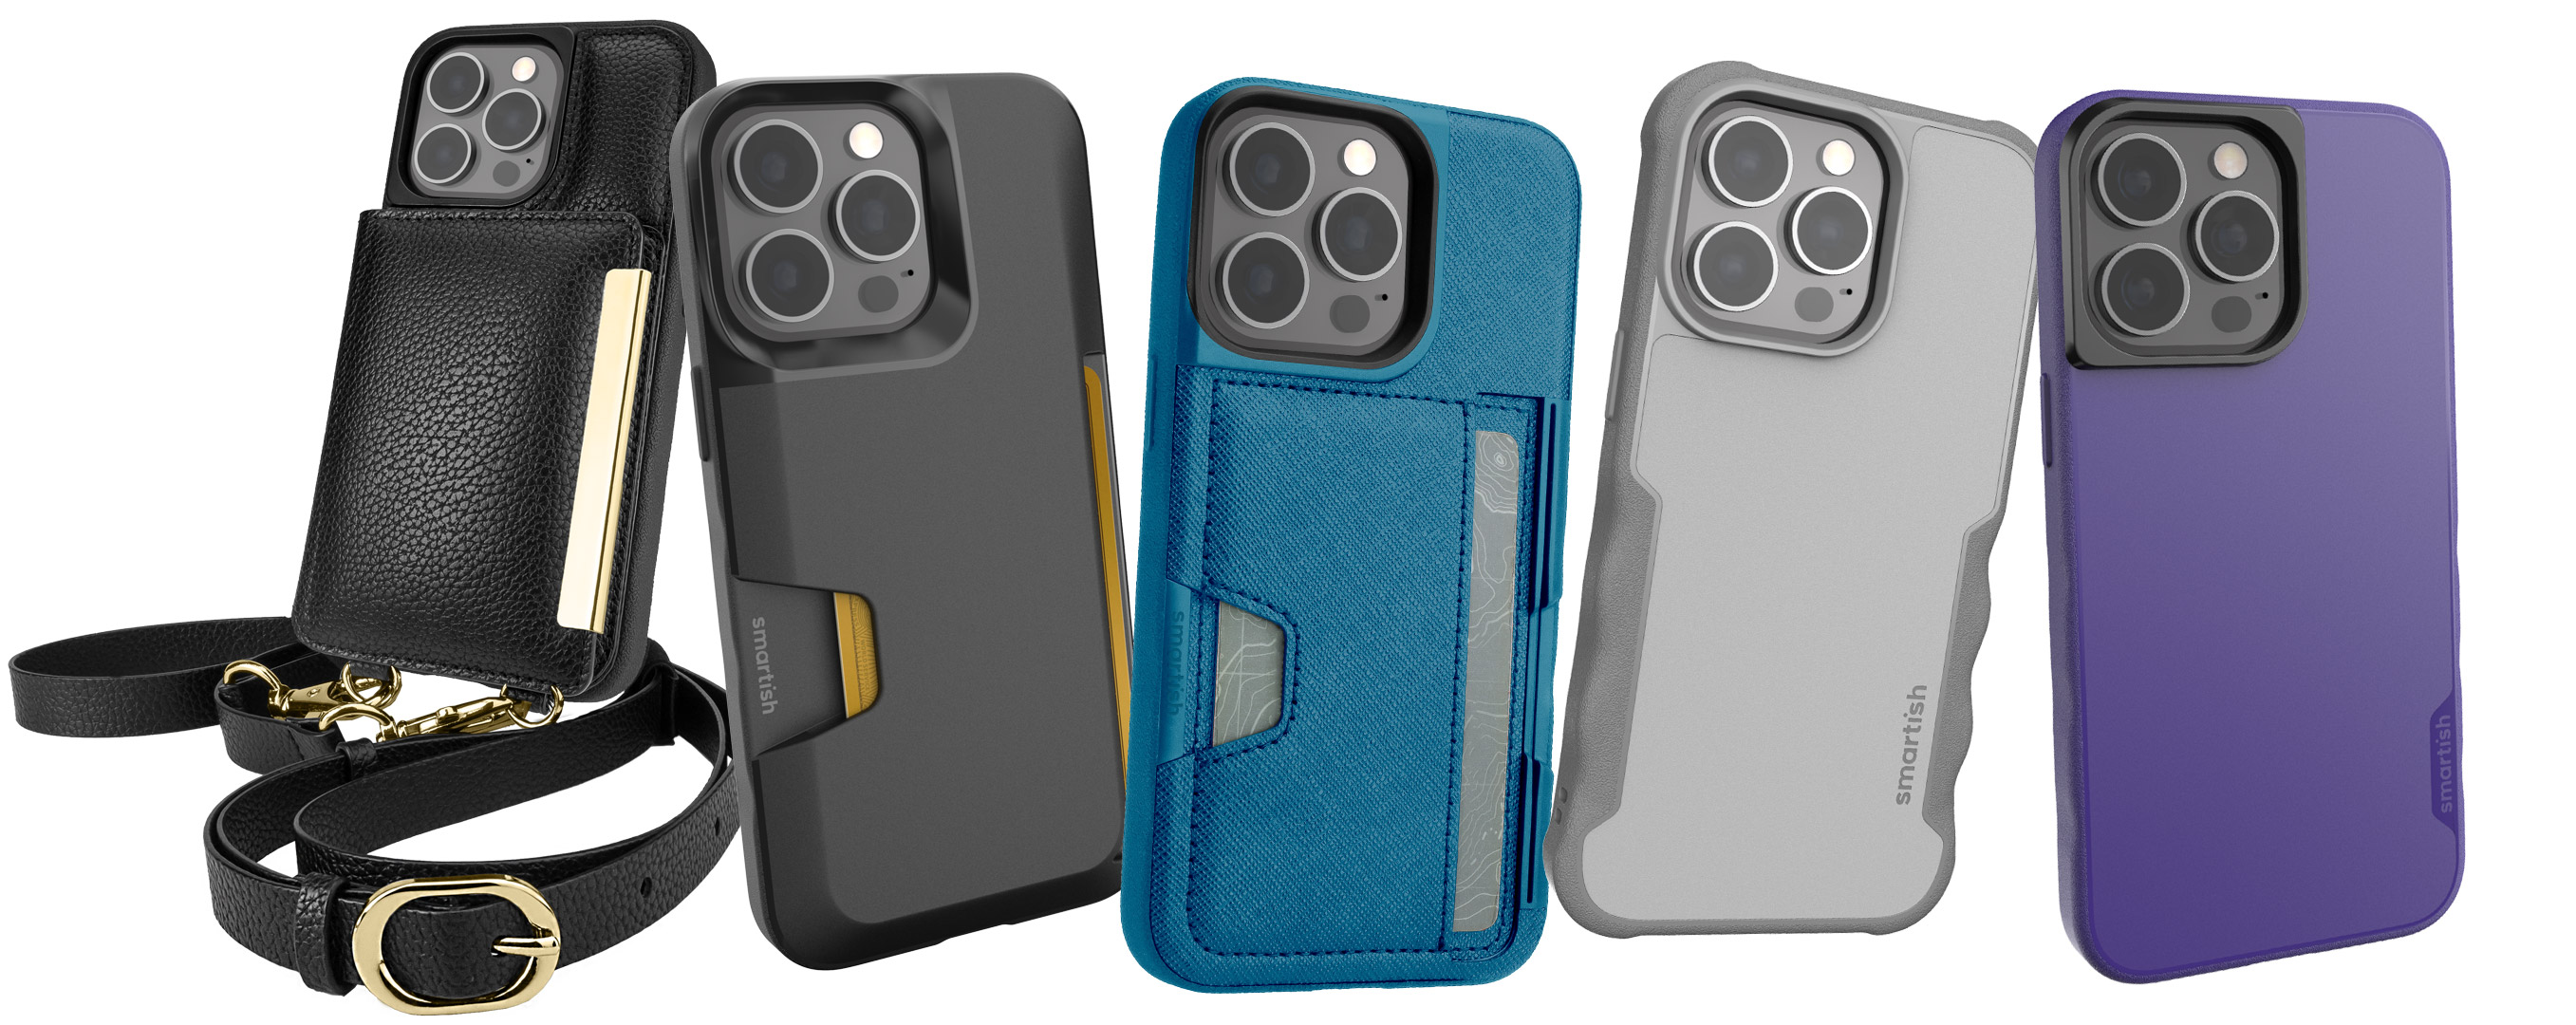 Smartish iPhone 13 cases